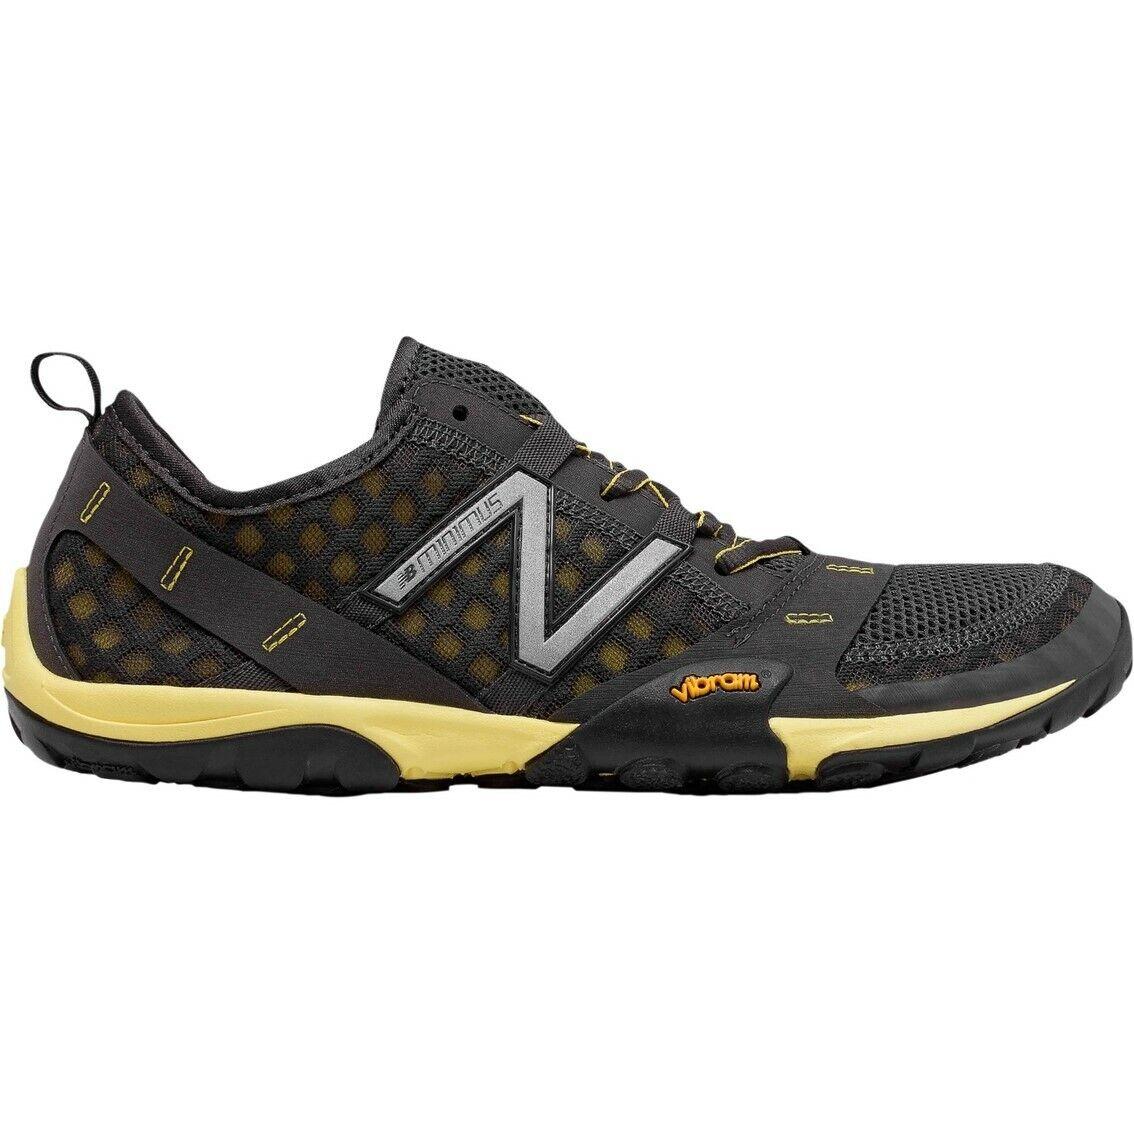 New Balance MT10 V1 Minimus Mens Gray/Yellow Trail Running S